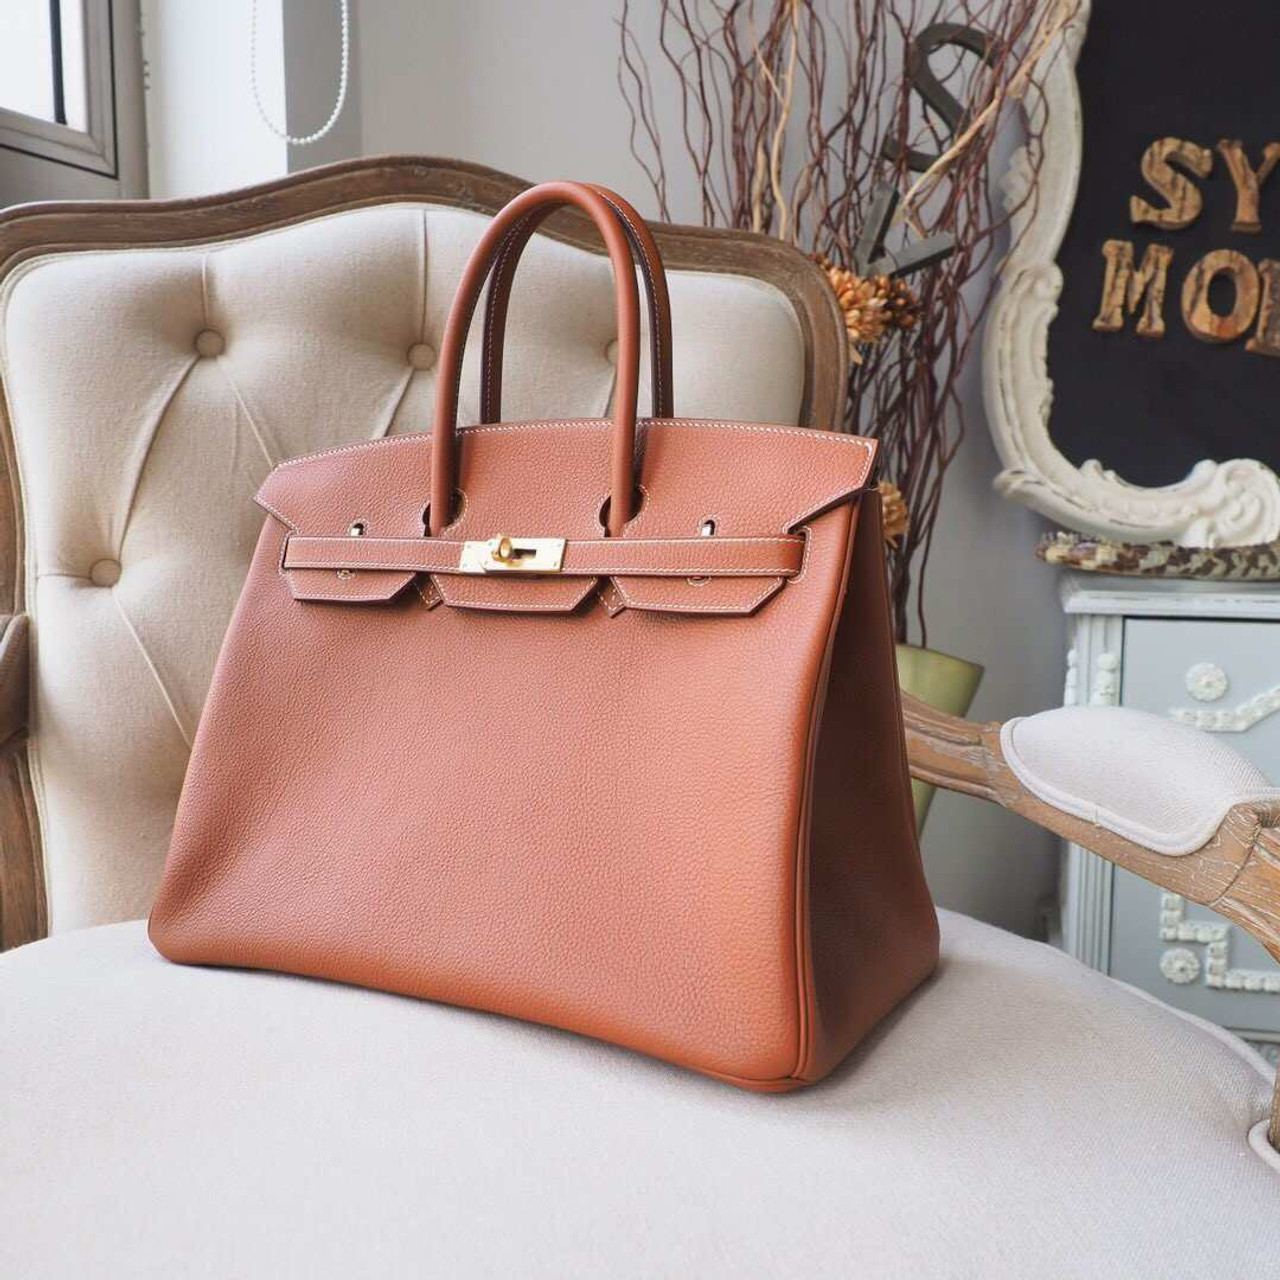 d6f13f6caee Hermes Birkin 35cm Bag Togo Calfskin Leather Palladium Hardware ...